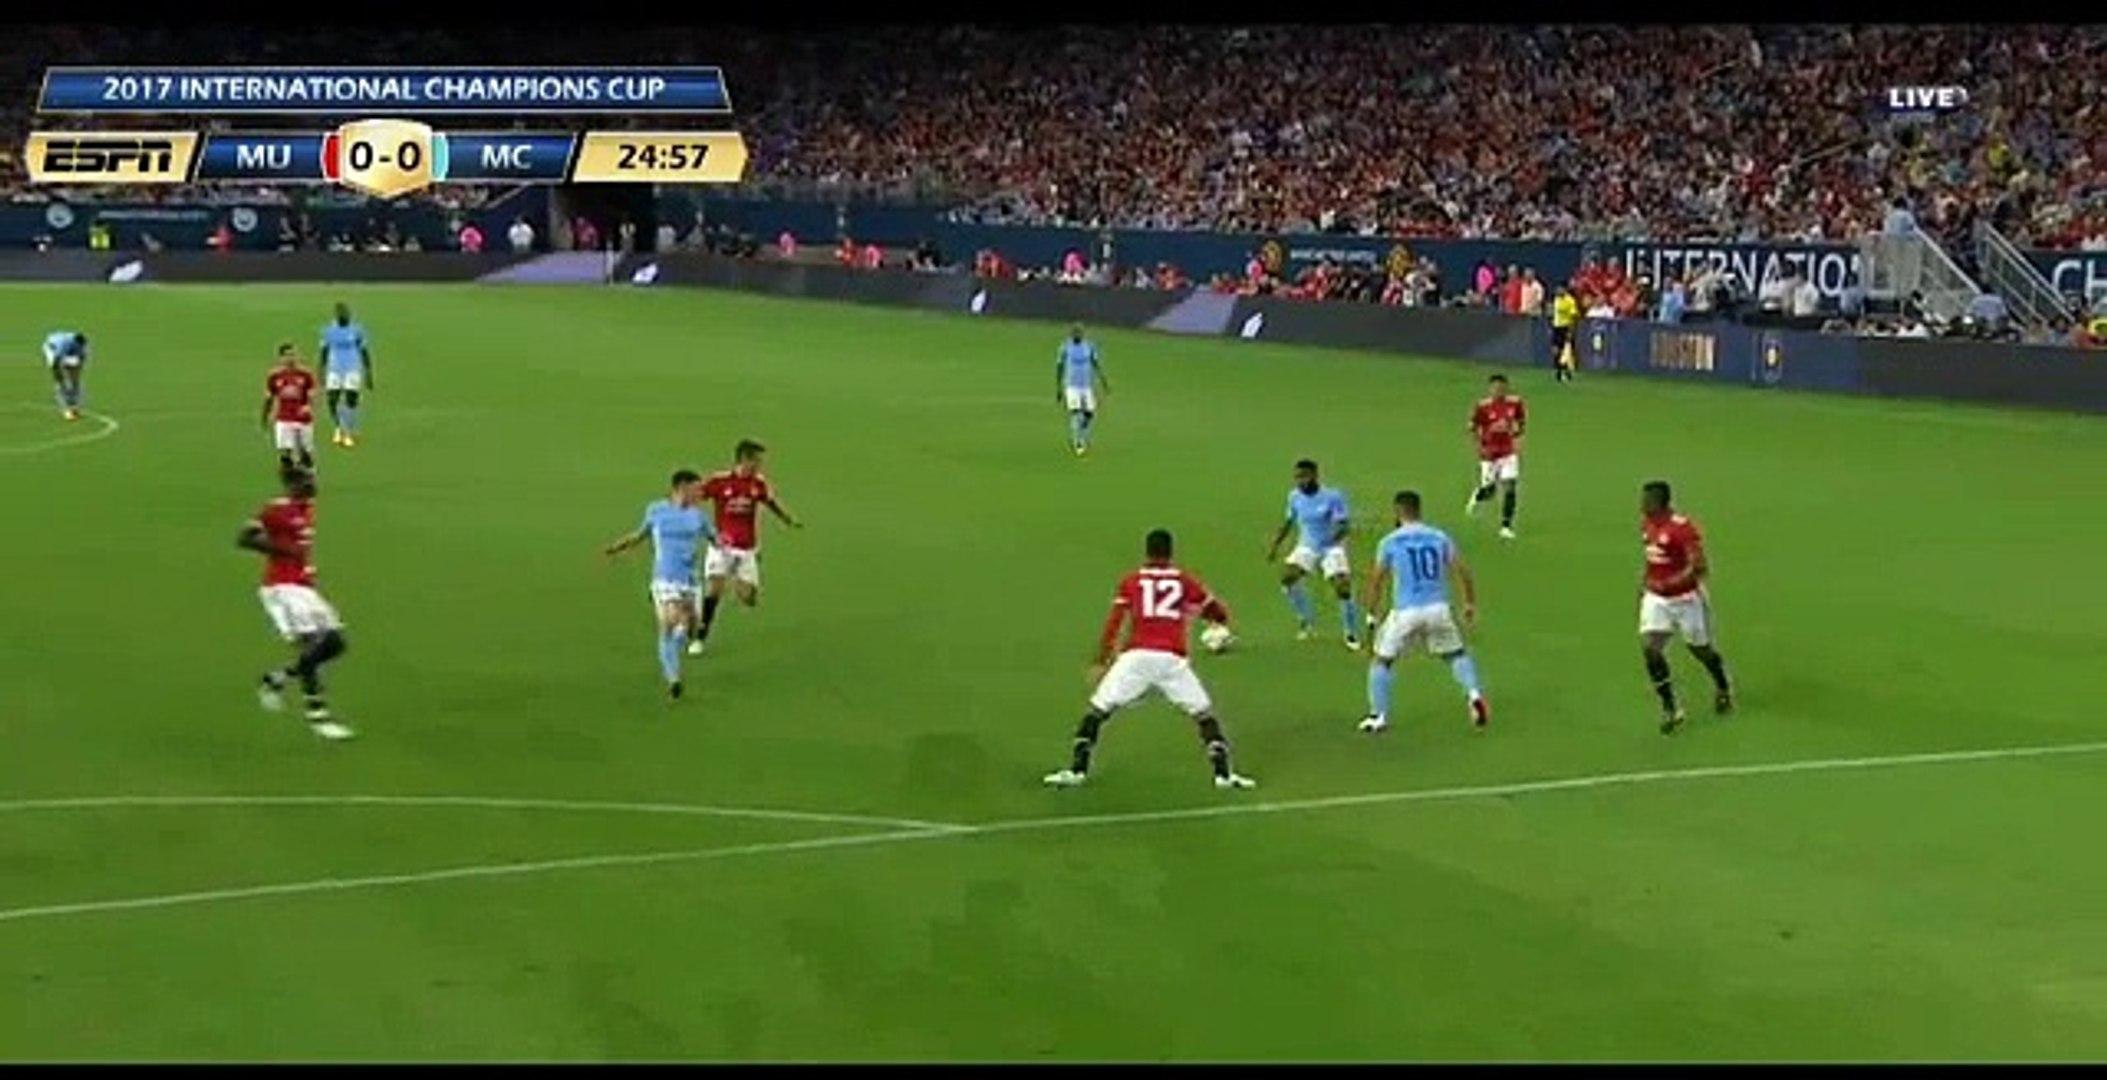 Raheem Sterling Amazing chance - Manchester City 0-0 Manchester United - 20.07.2017 International Ch